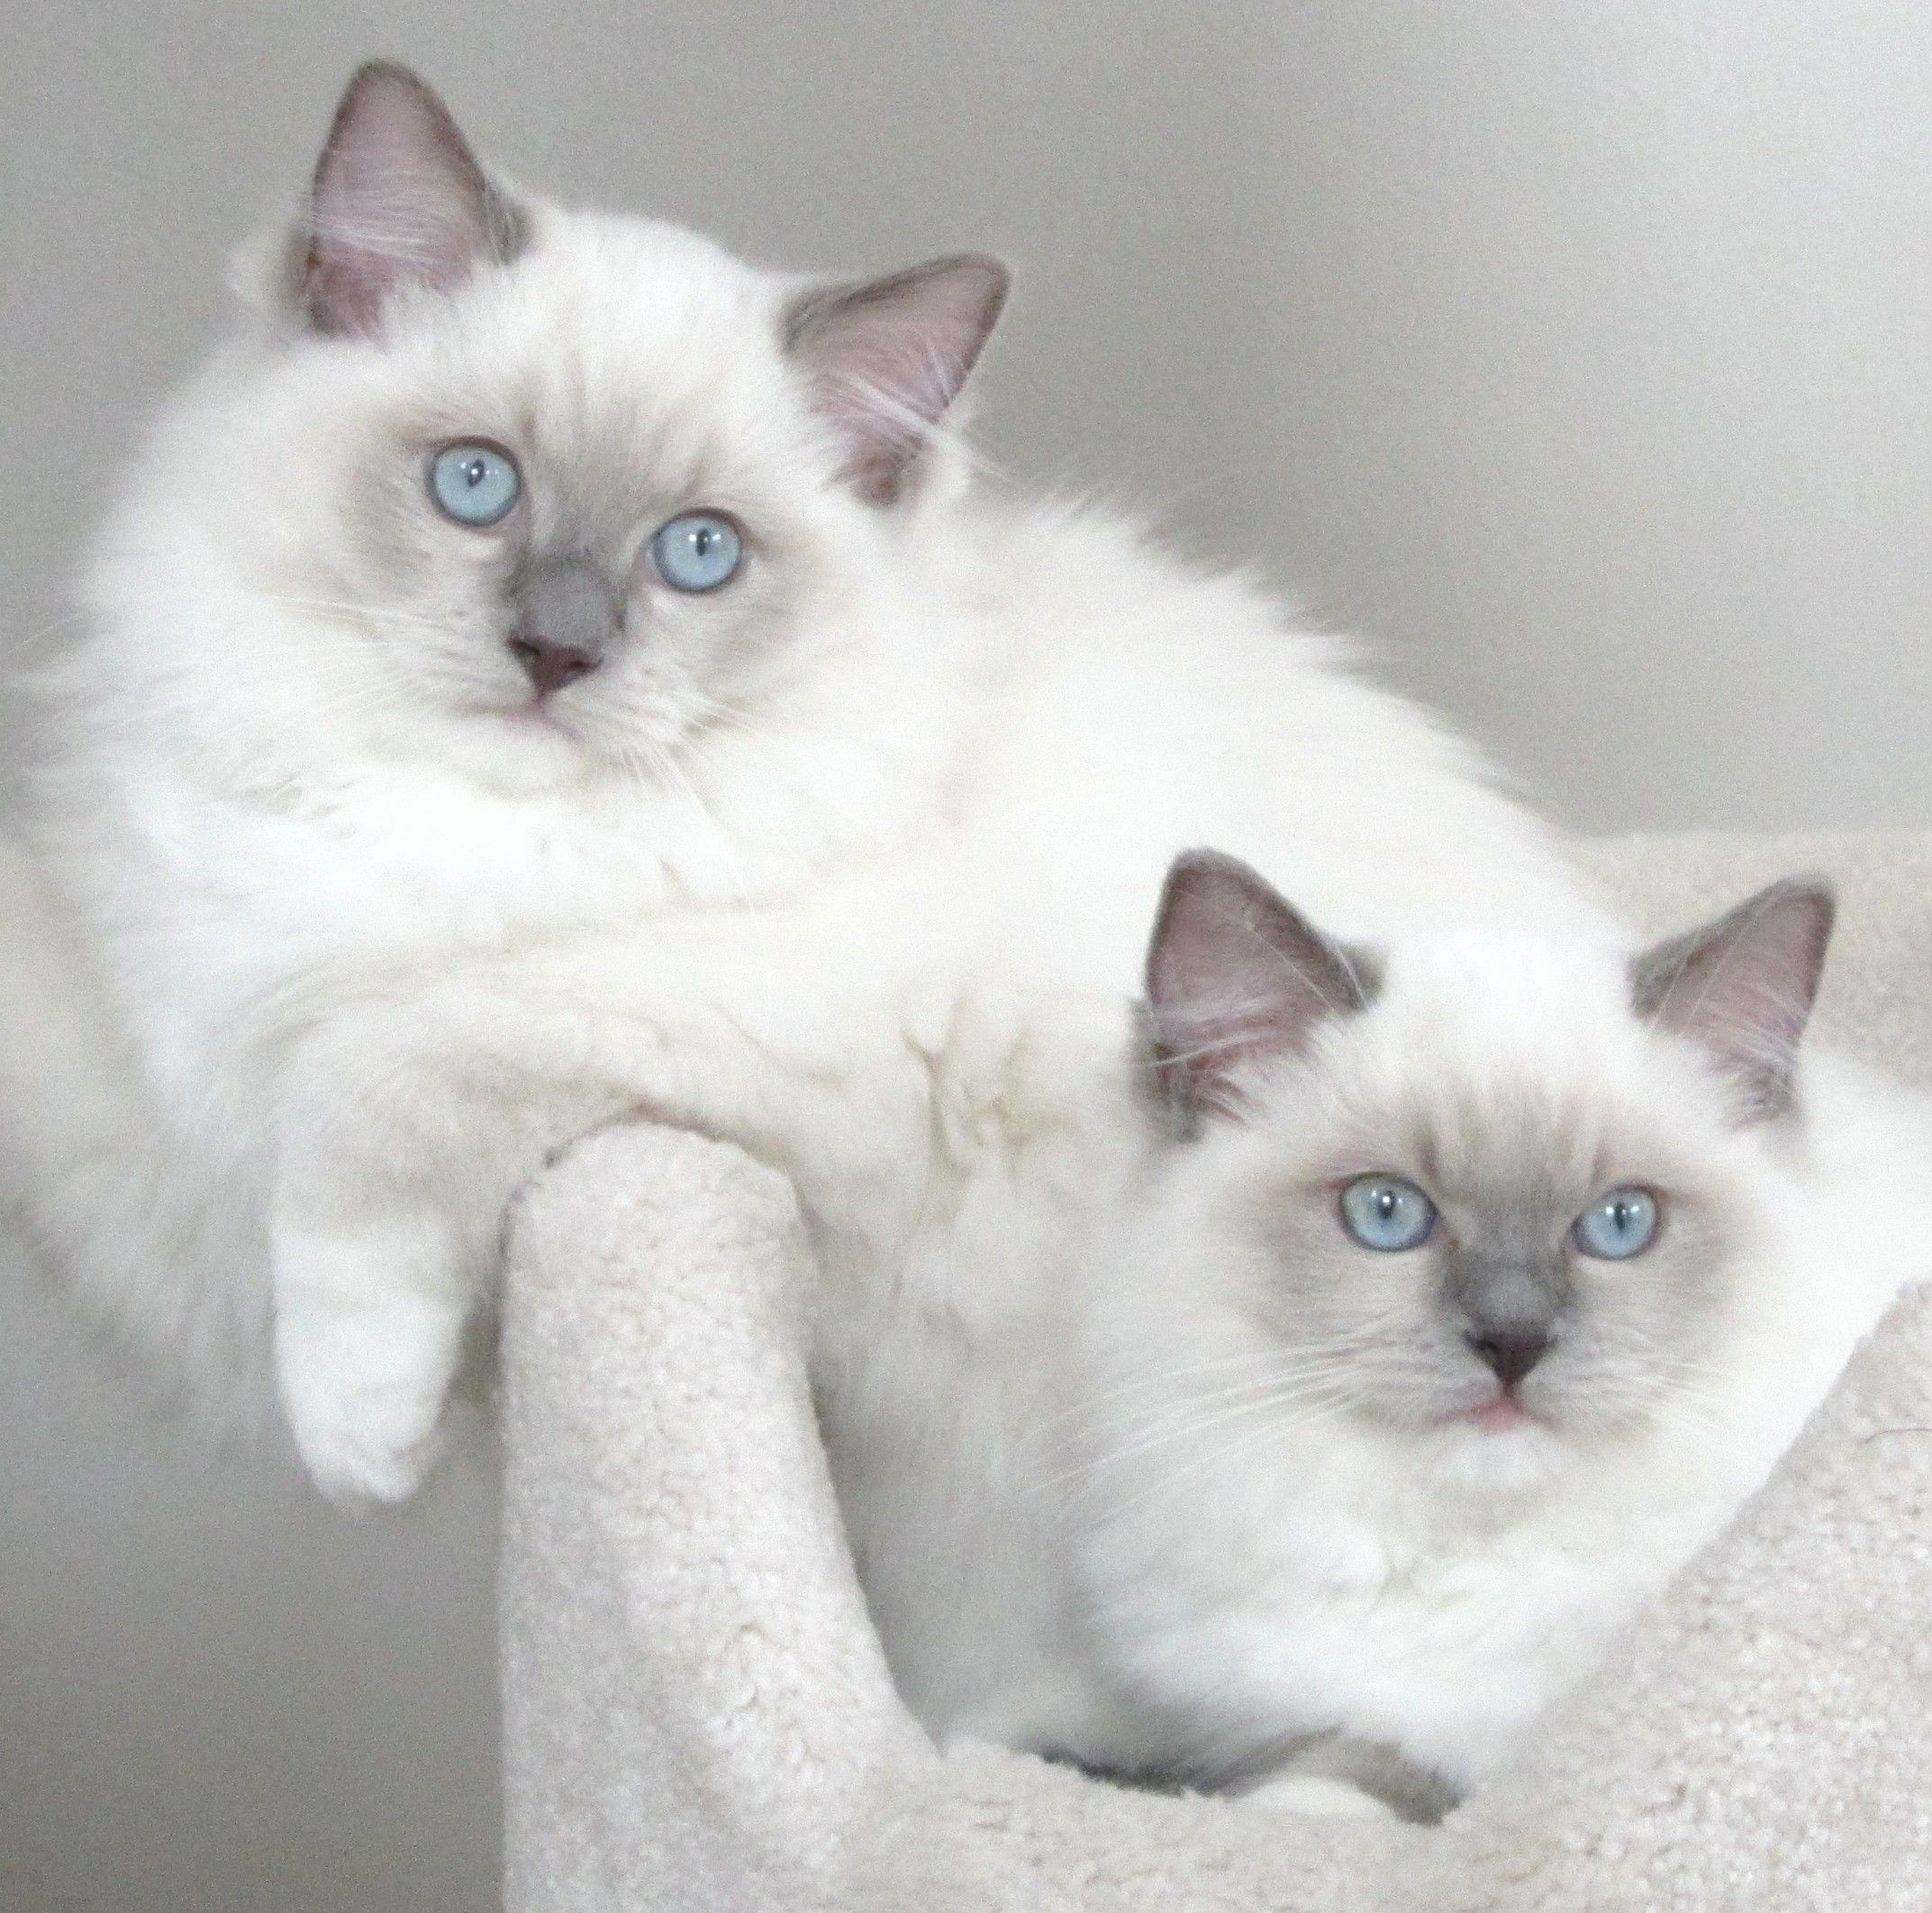 Cupcake & Sushi Kittens cutest, Cute cats, Beautiful cats